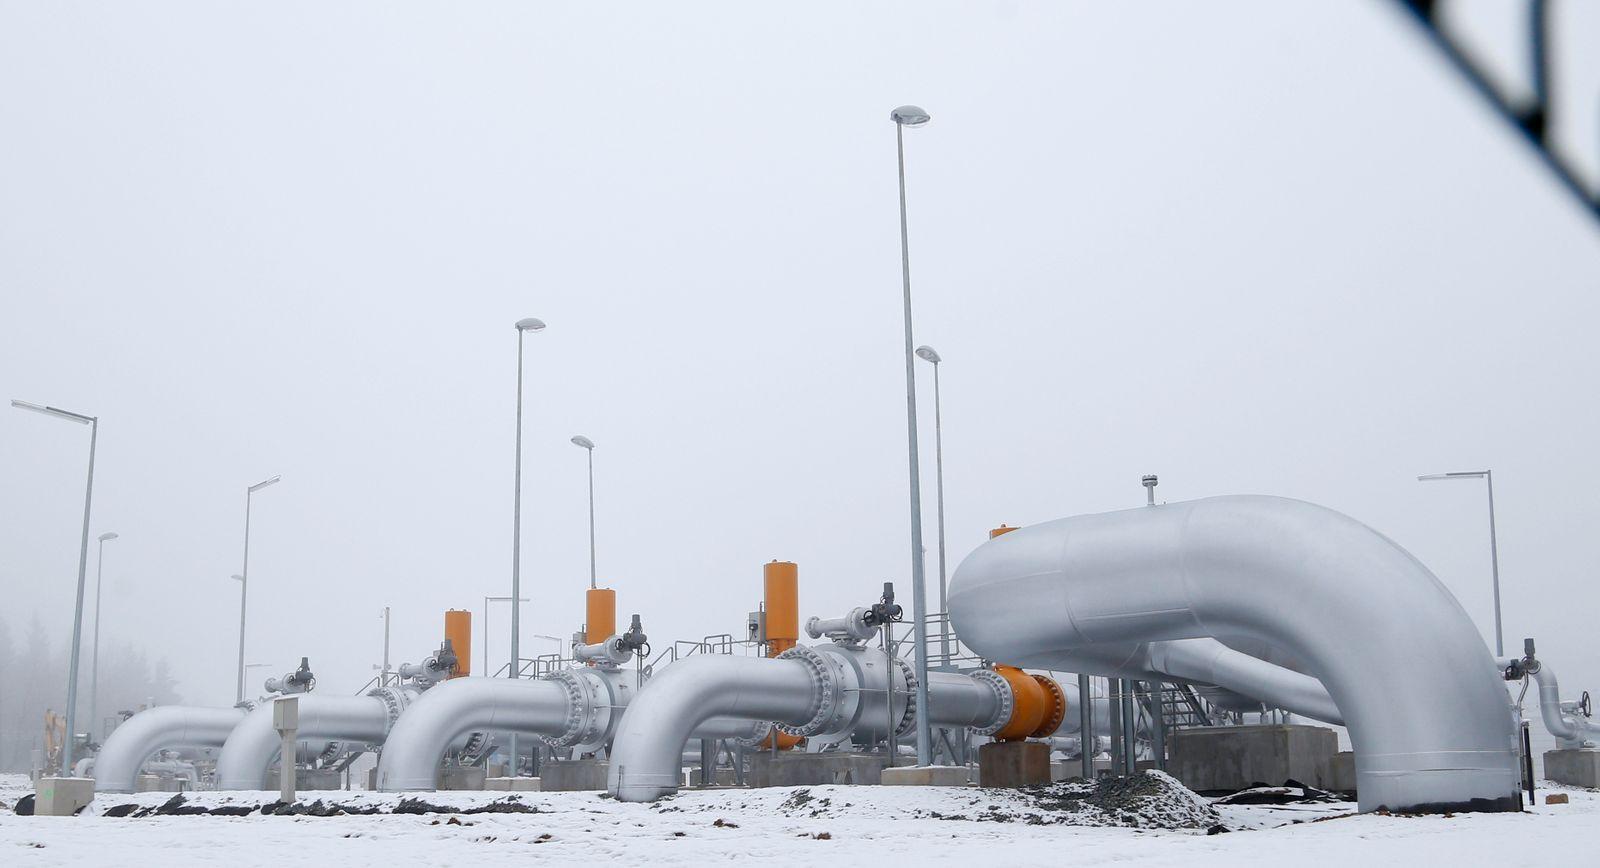 Tschechien / Erdgas / Pipeline / Gaspipeline